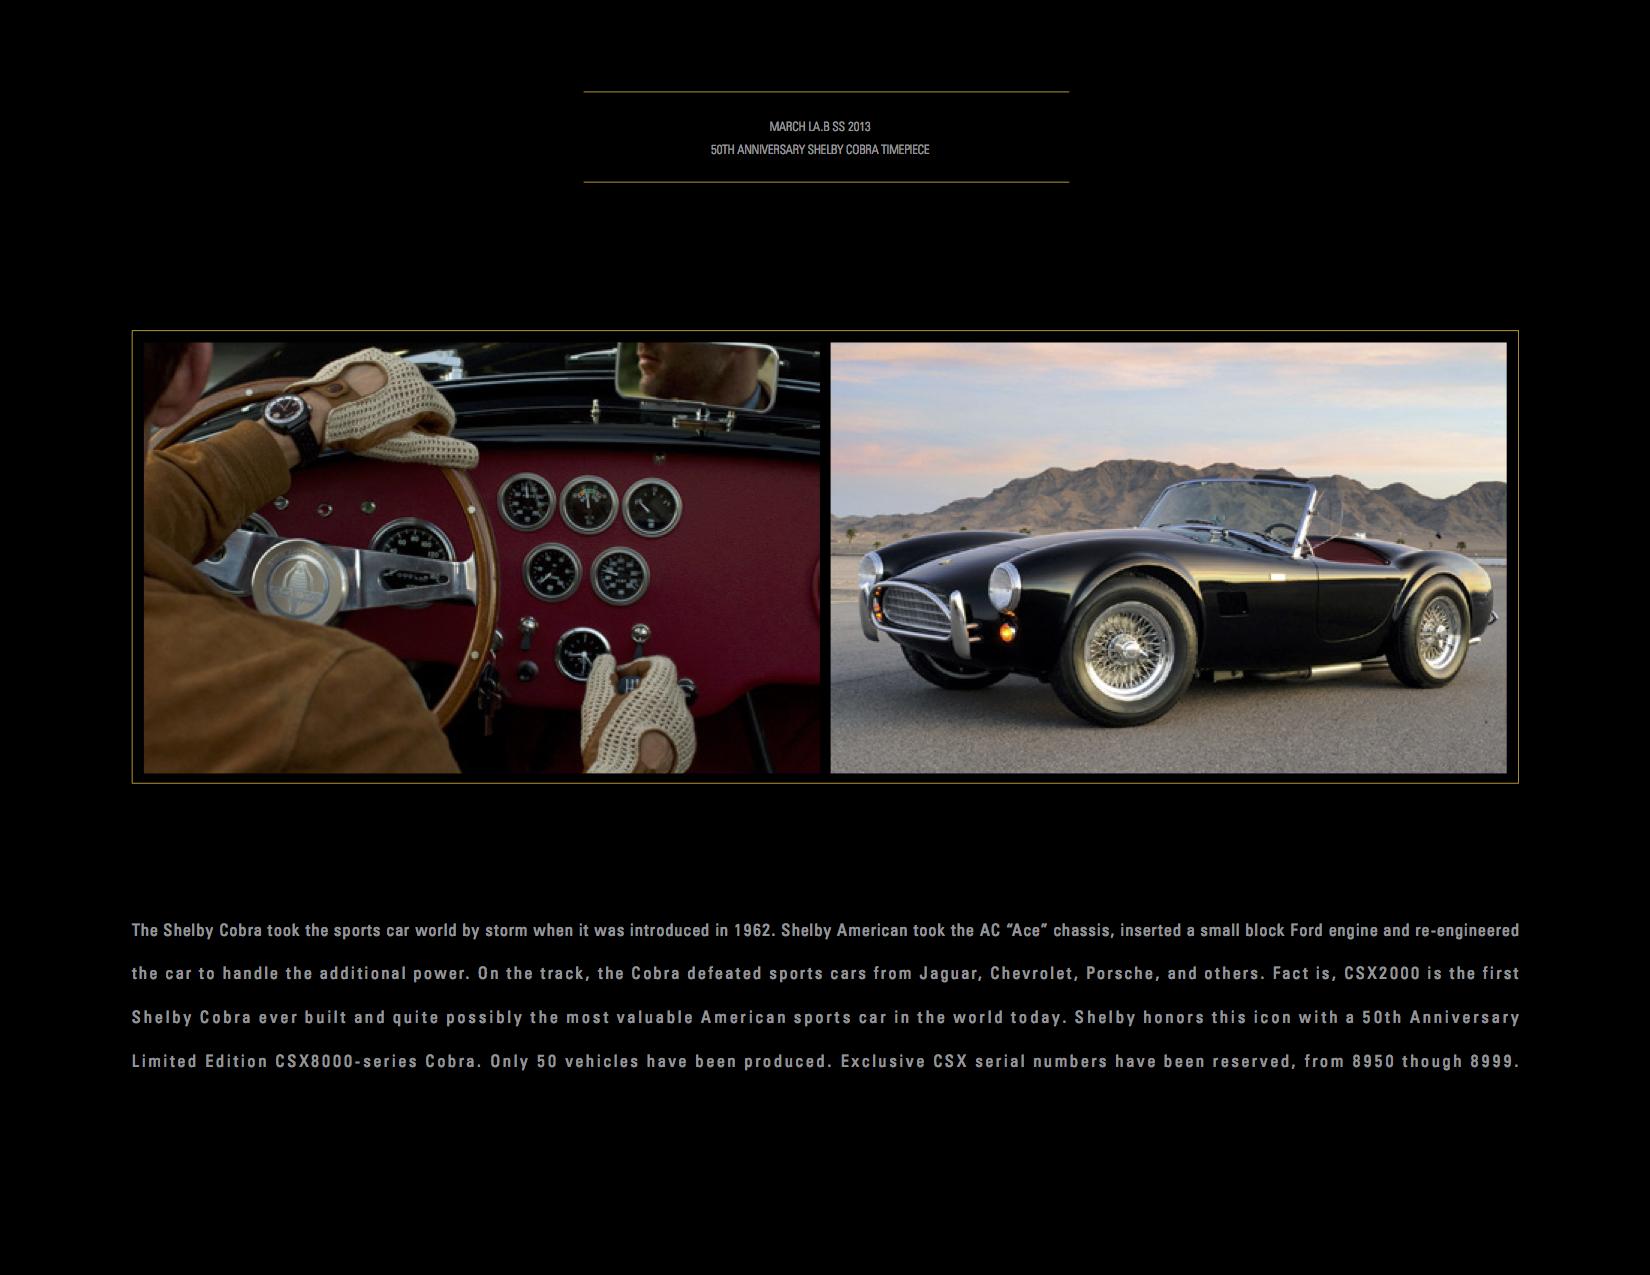 AM3_50th AnniversaryI_Shelby_CobraC.jpg